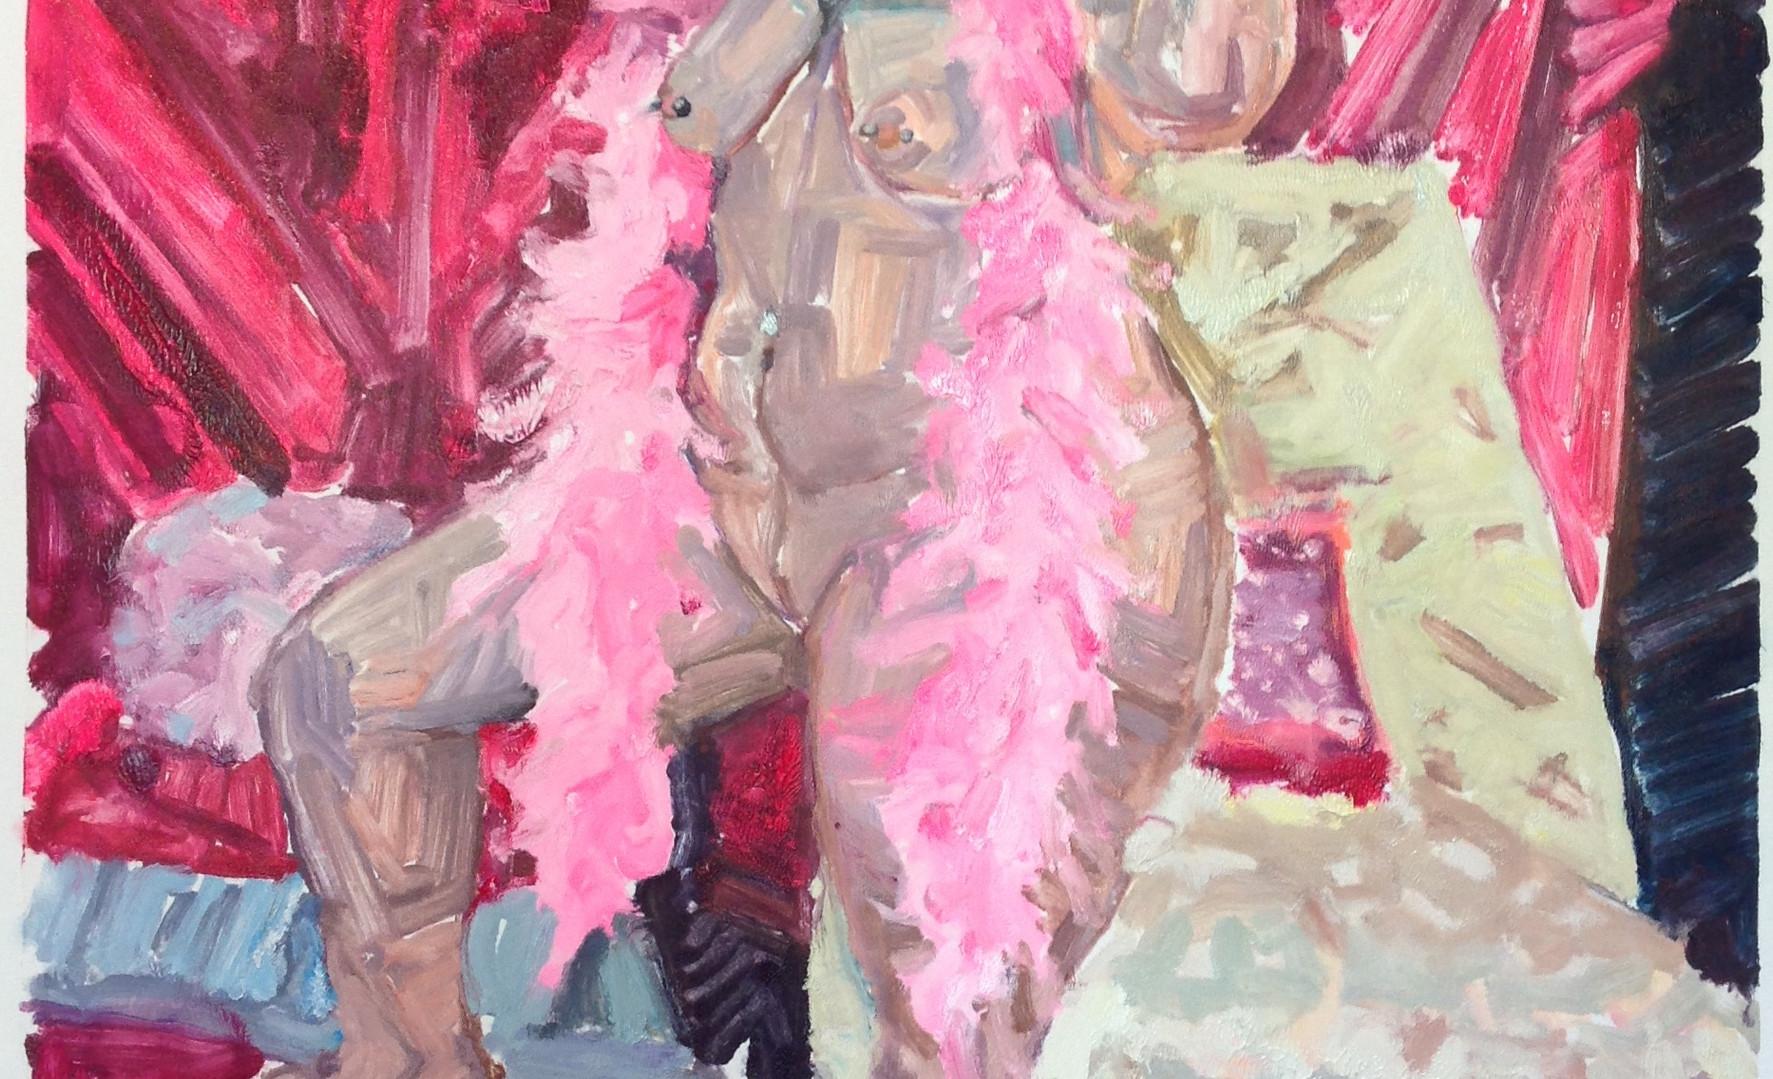 Tapley_Saralene_Sinke Nude With Pink Boa_monotype_4.jpg